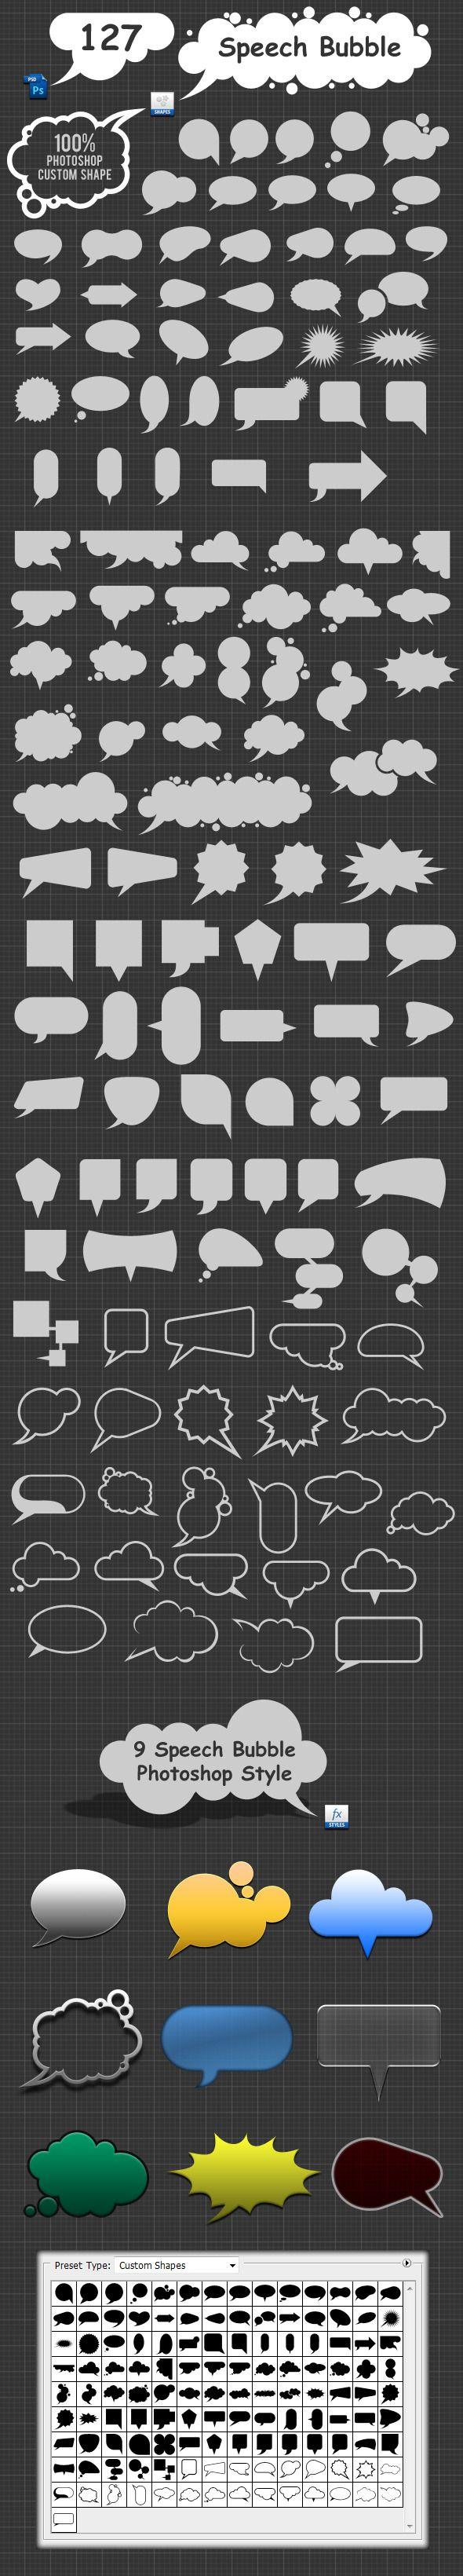 127 Speech Bubble Photoshop Custom Shapes  #template #thinking #$4